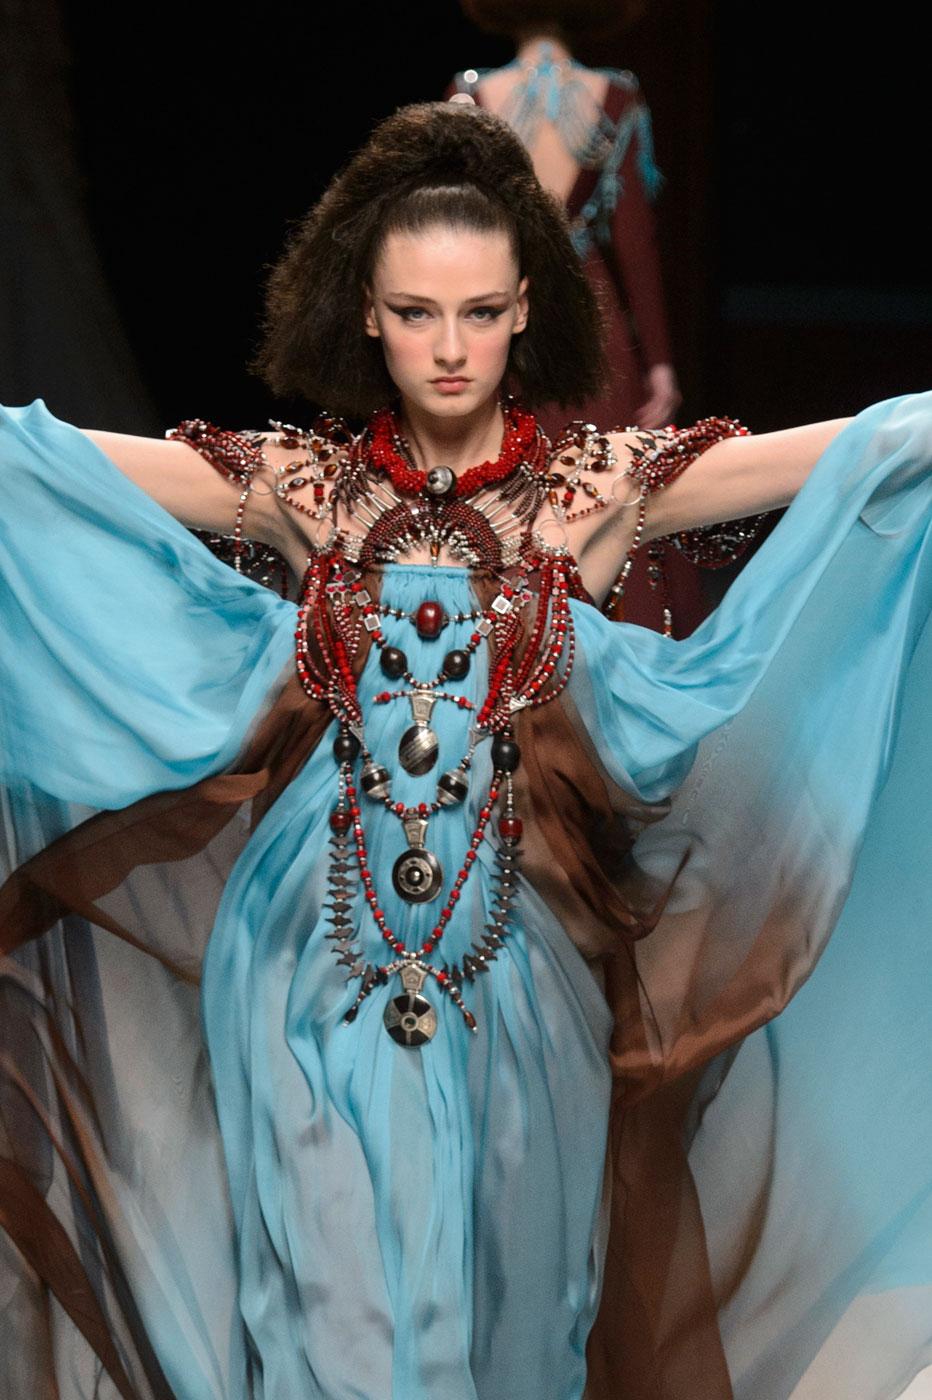 Julien-Fournie-Prive-fashion-runway-show-haute-couture-paris-spring-2015-the-impression-52